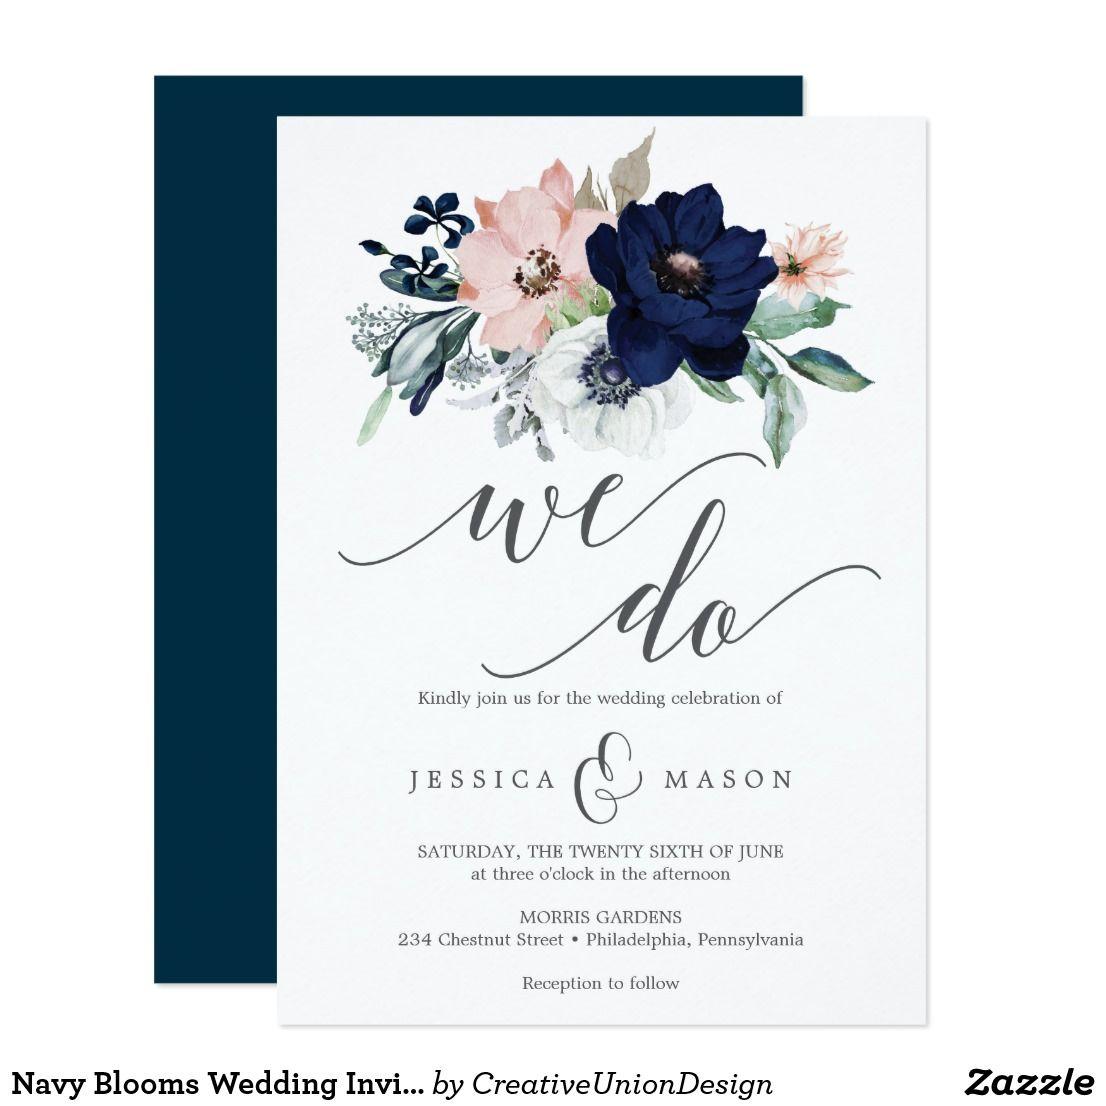 Navy Blooms Wedding Invitation Zazzle Com Wedding Invitations Wedding Invitations Boho Cheap Wedding Invitations